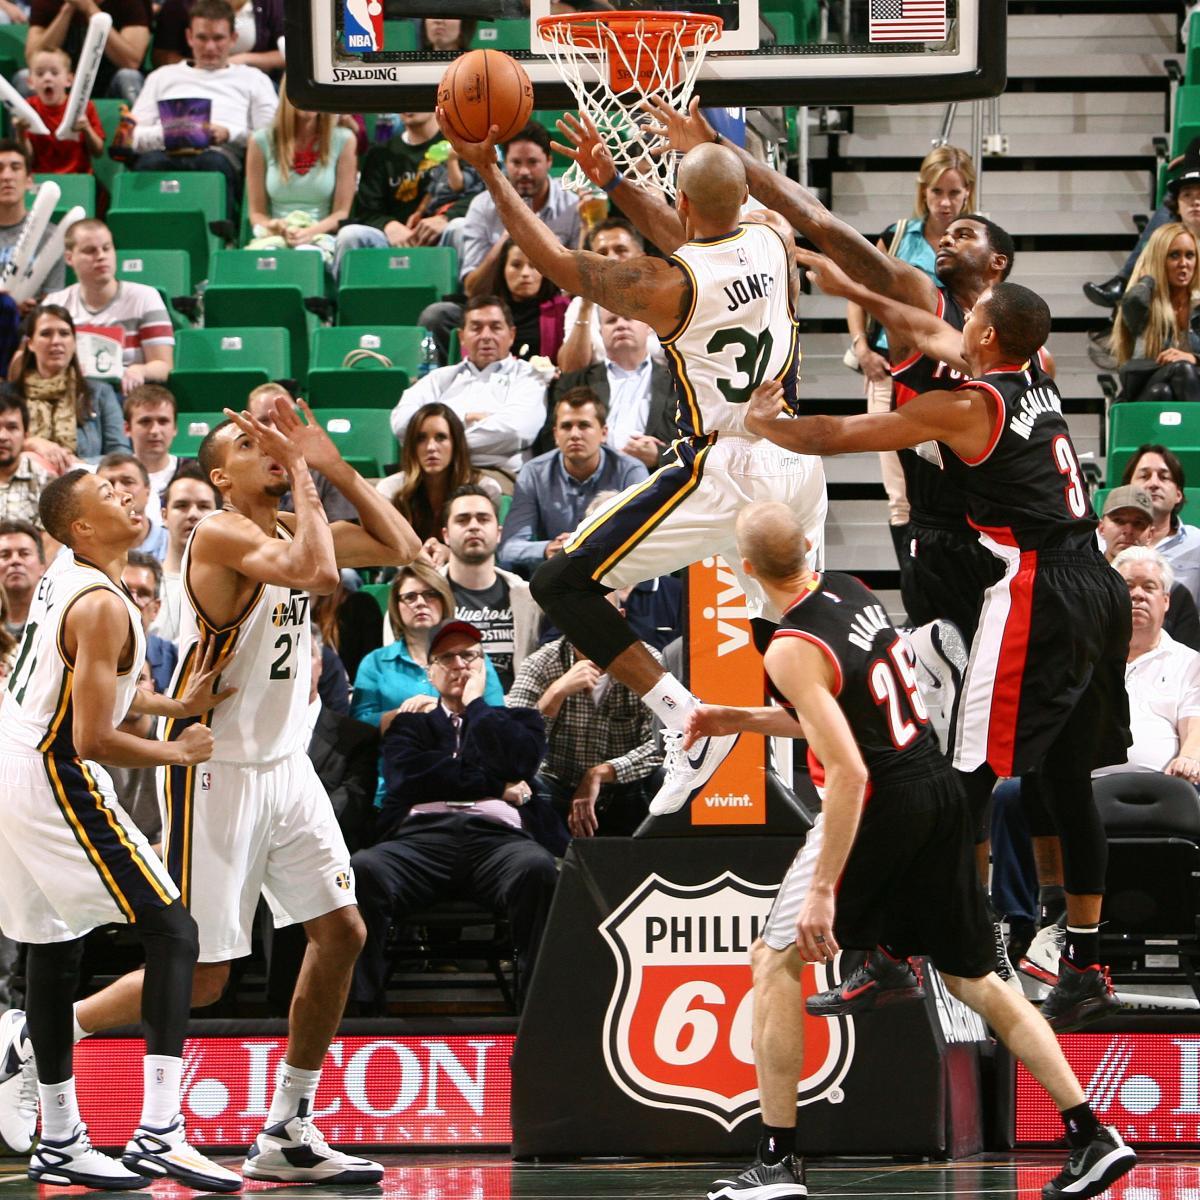 Portland Trail Blazers Vs. Utah Jazz 10/7/14: Video